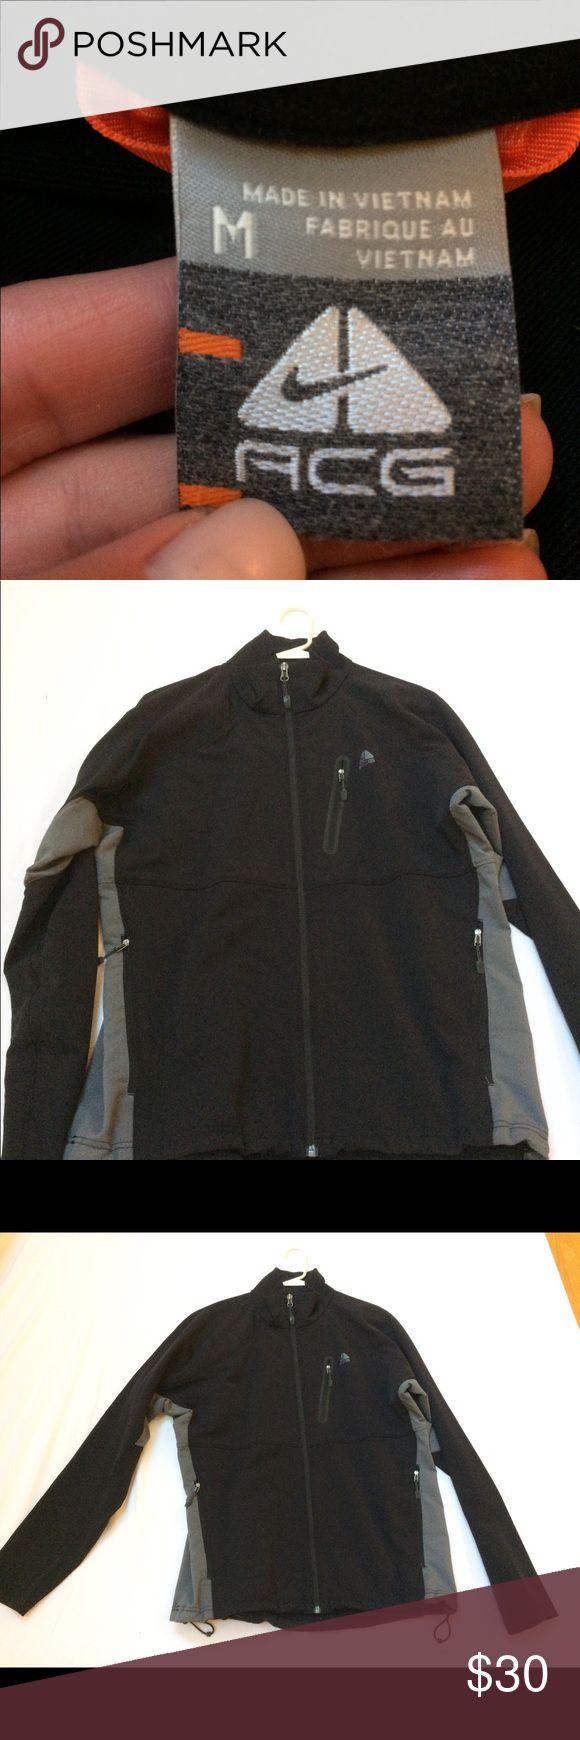 Nike ACG fully lined jacket Black and gray; EUC! Exterior pockets, adjustable waist, full-zip lightweight jacket/windbreaker. Easily folds and fits into luggage, golf bag, or bag. Nike ACG Jackets & Coats Windbreakers